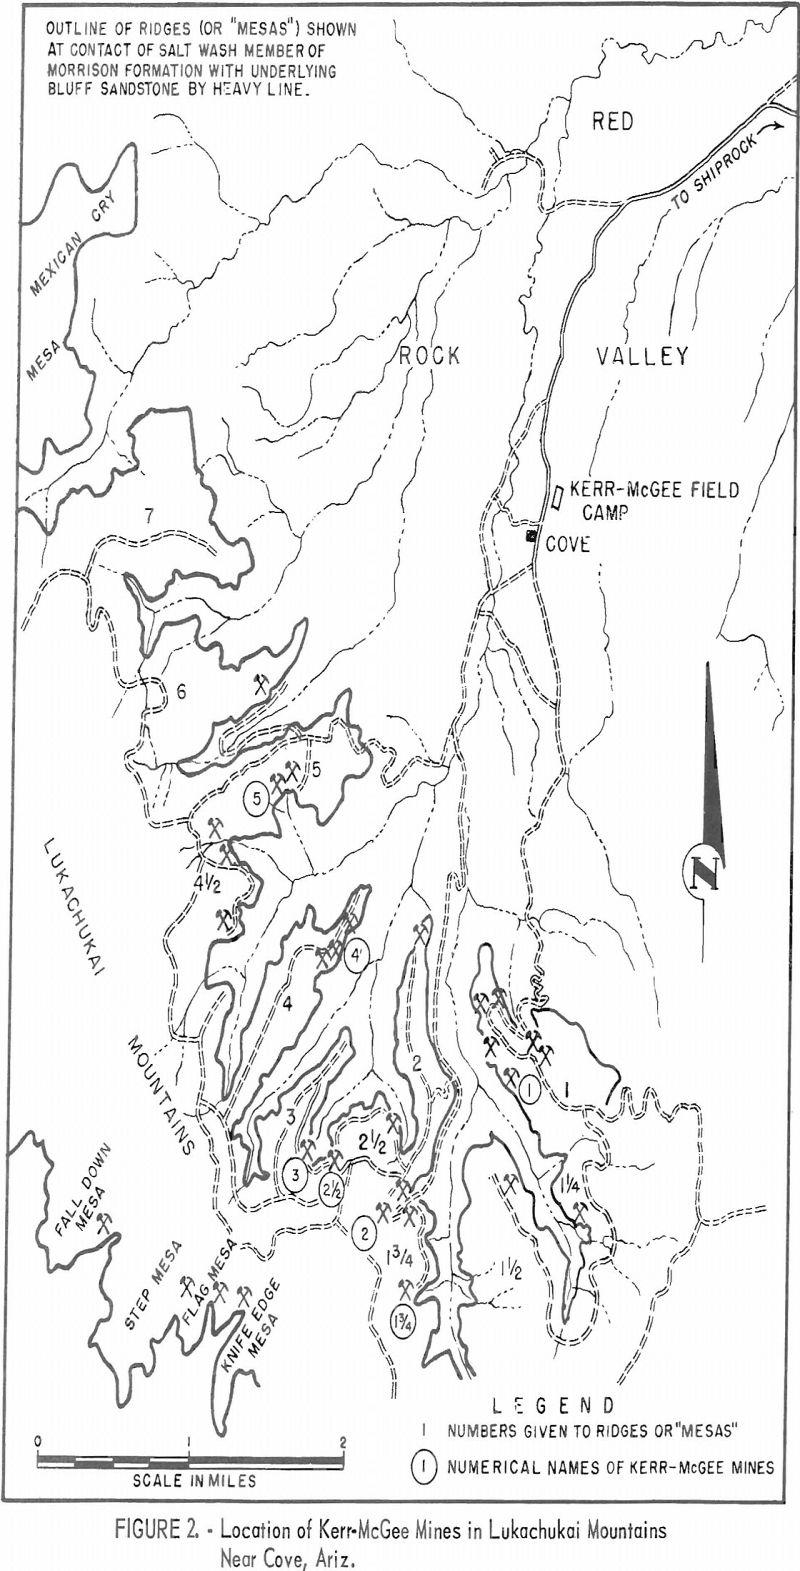 uranium mining location of kerr-mcgee mines